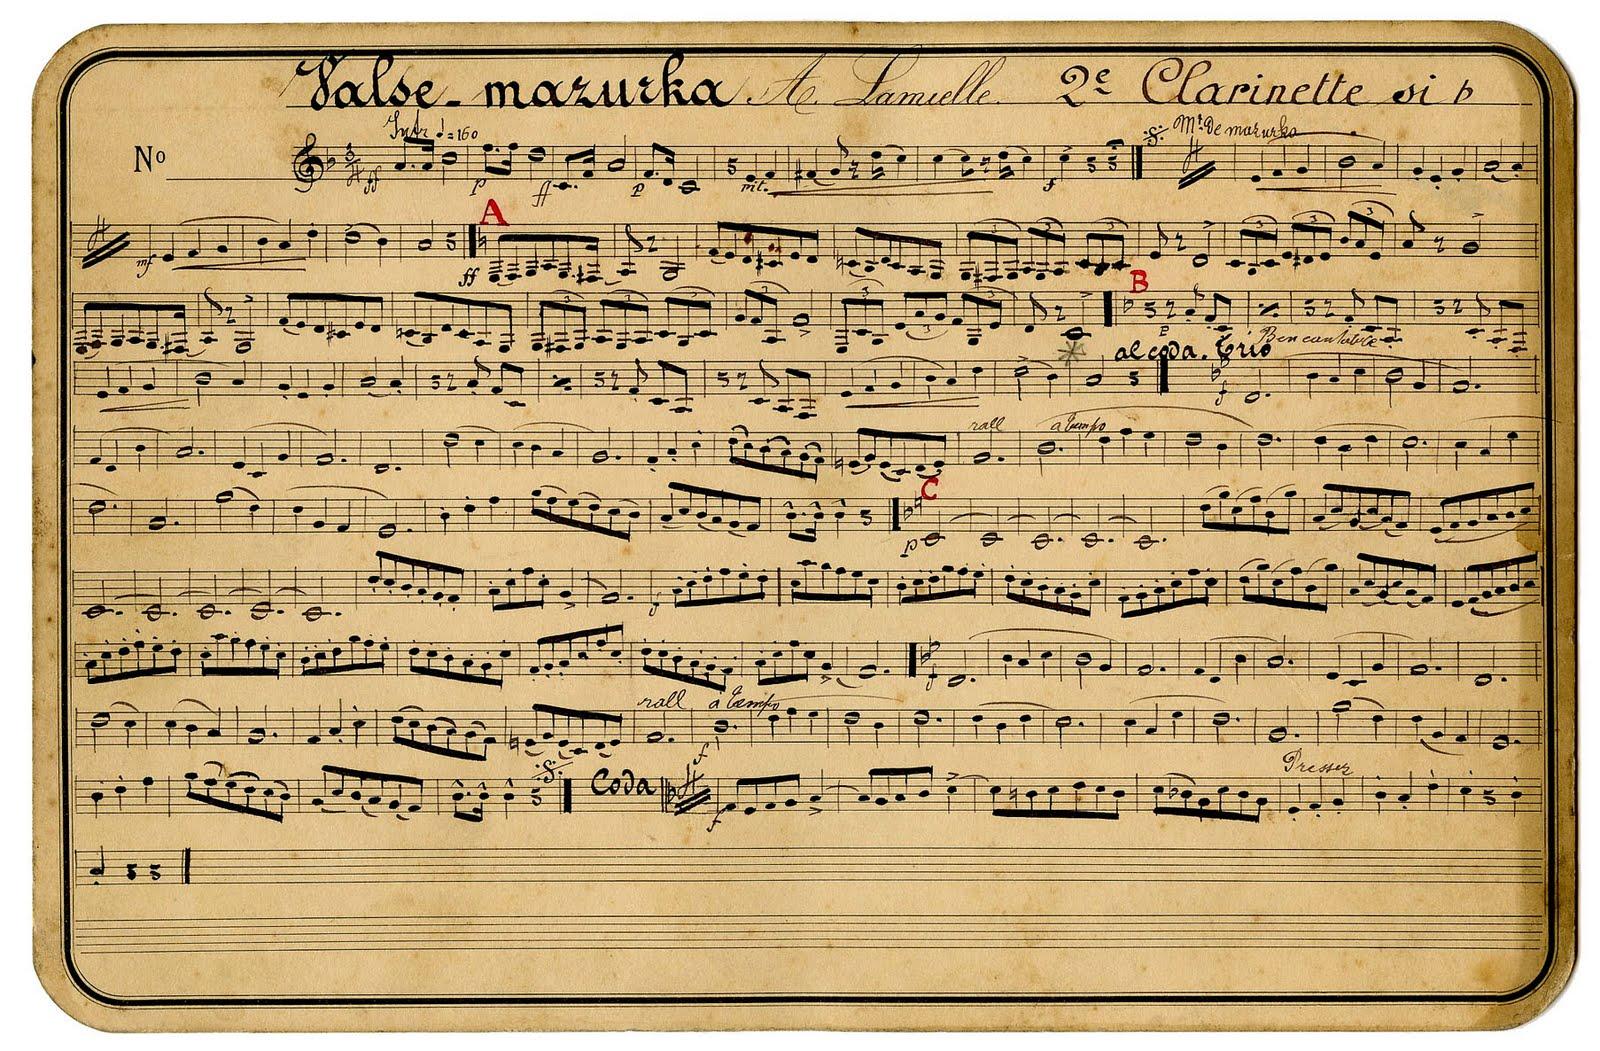 old looking sheet music - Heart.impulsar.co